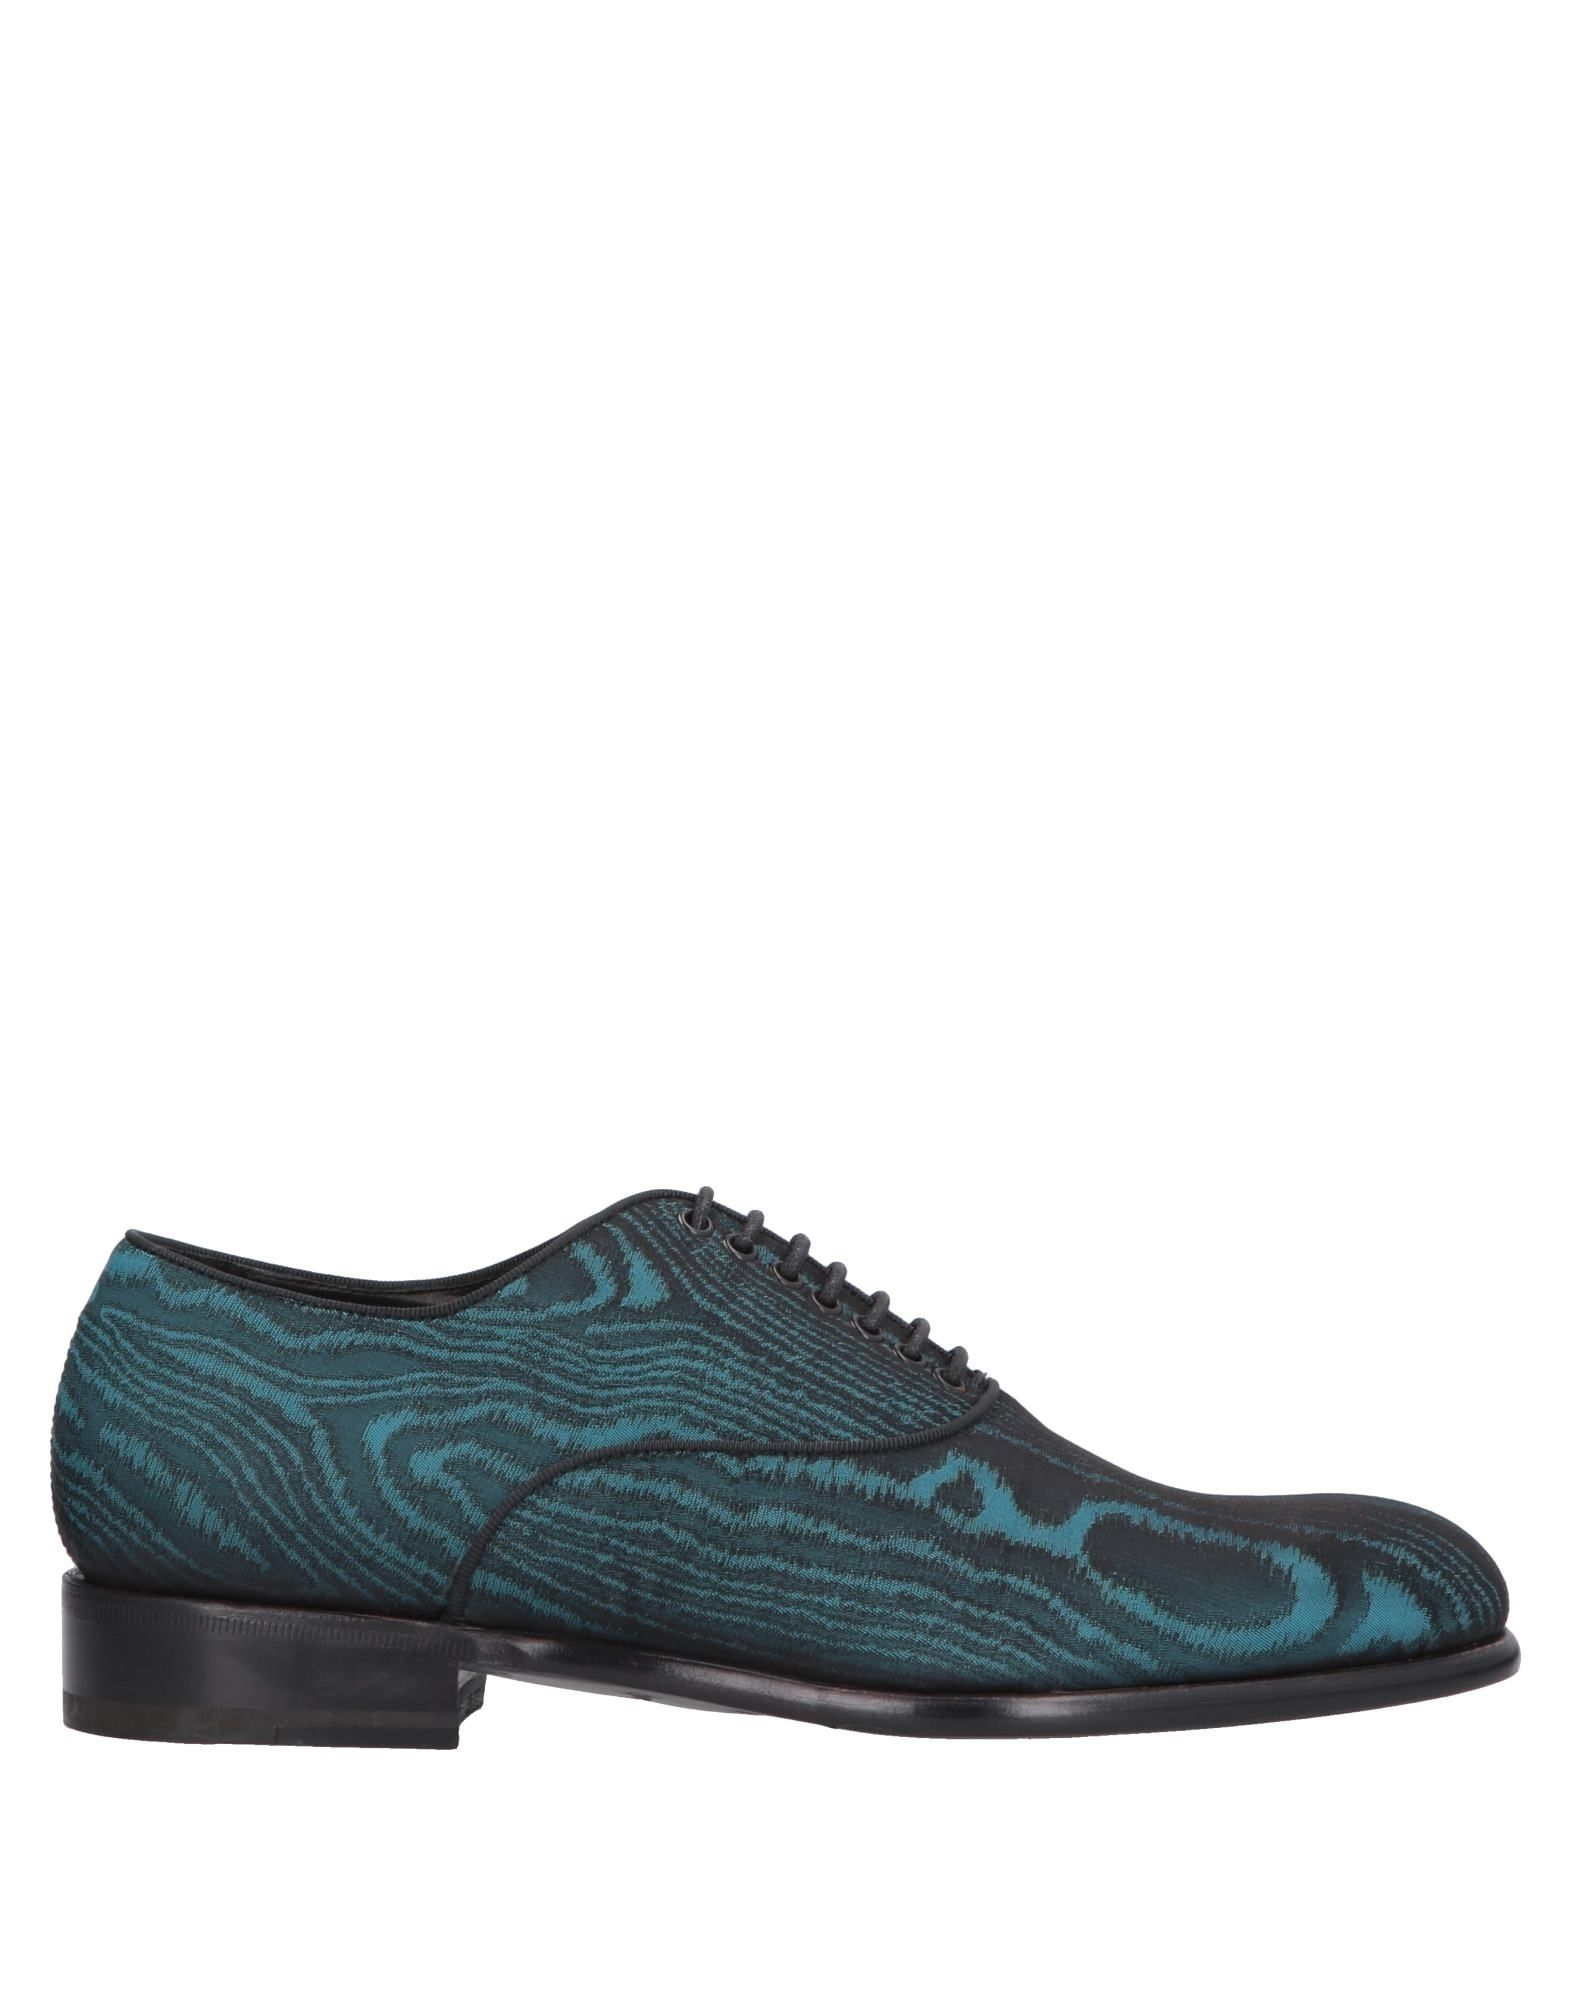 MAX VERRE Обувь на шнурках max limit обувь на шнурках